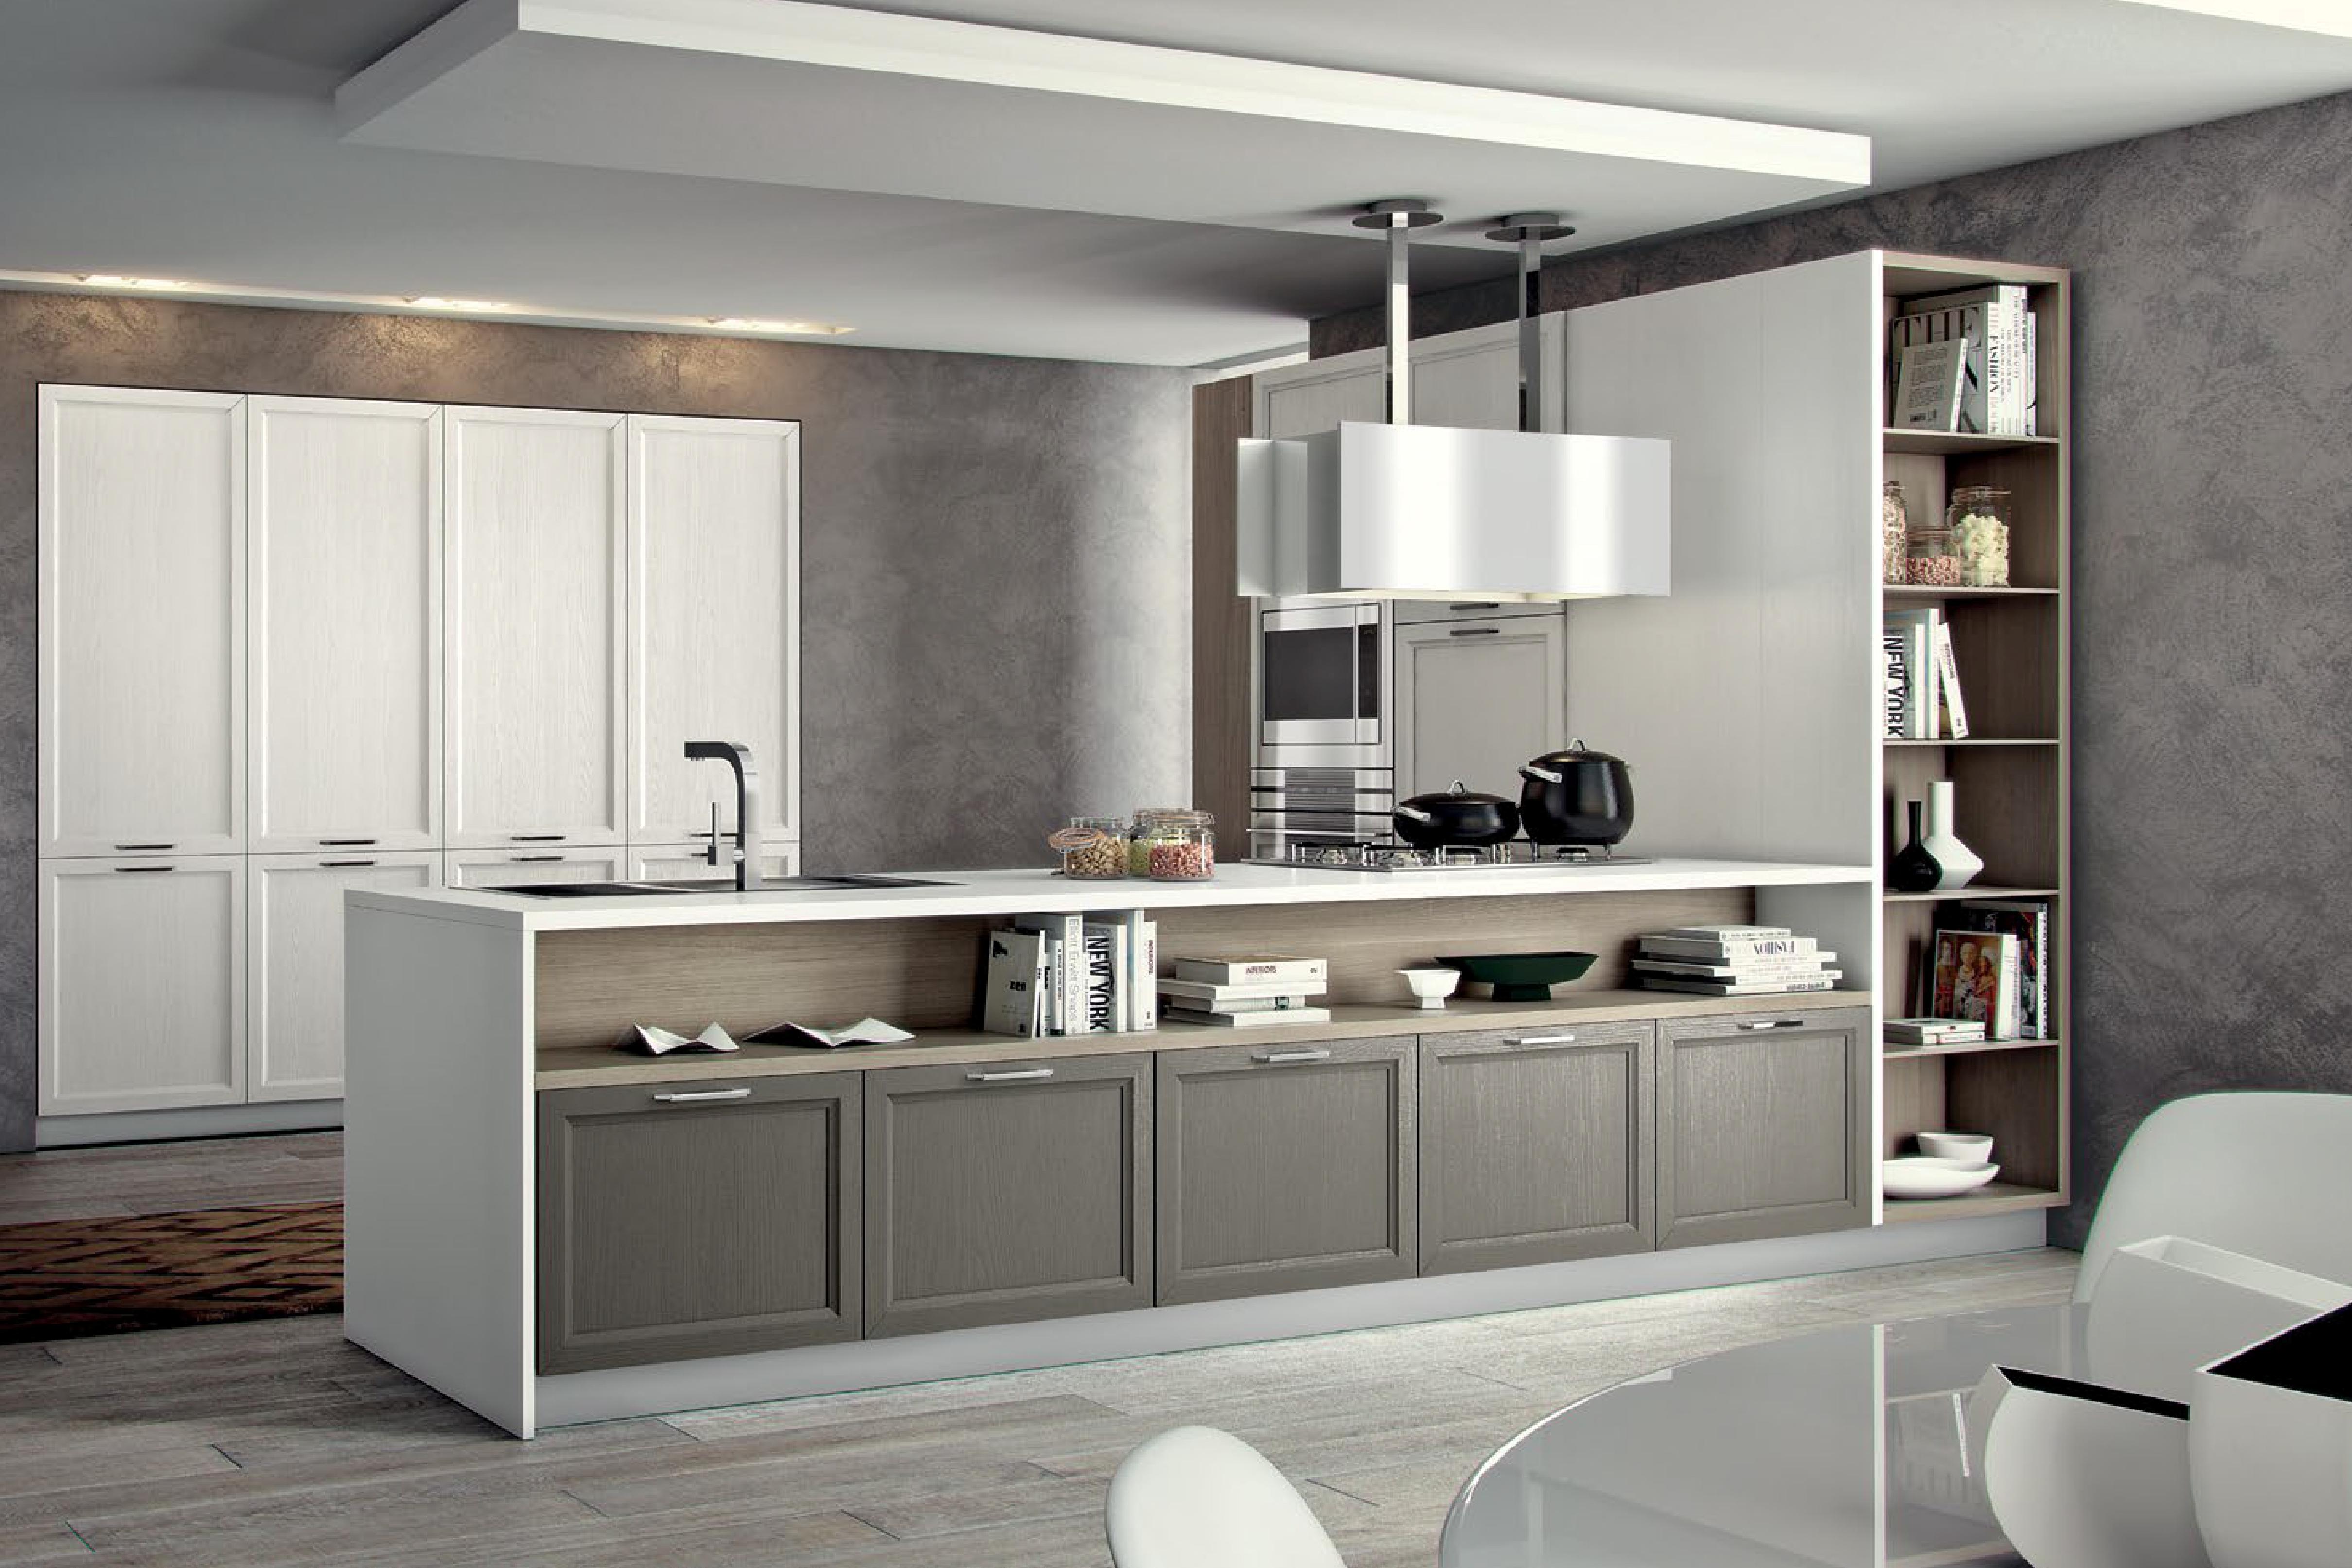 Cucine Moderne E Classiche Su Misura.Cucine Classiche O Cucine Moderne Ma Sempre Artigianali E Su